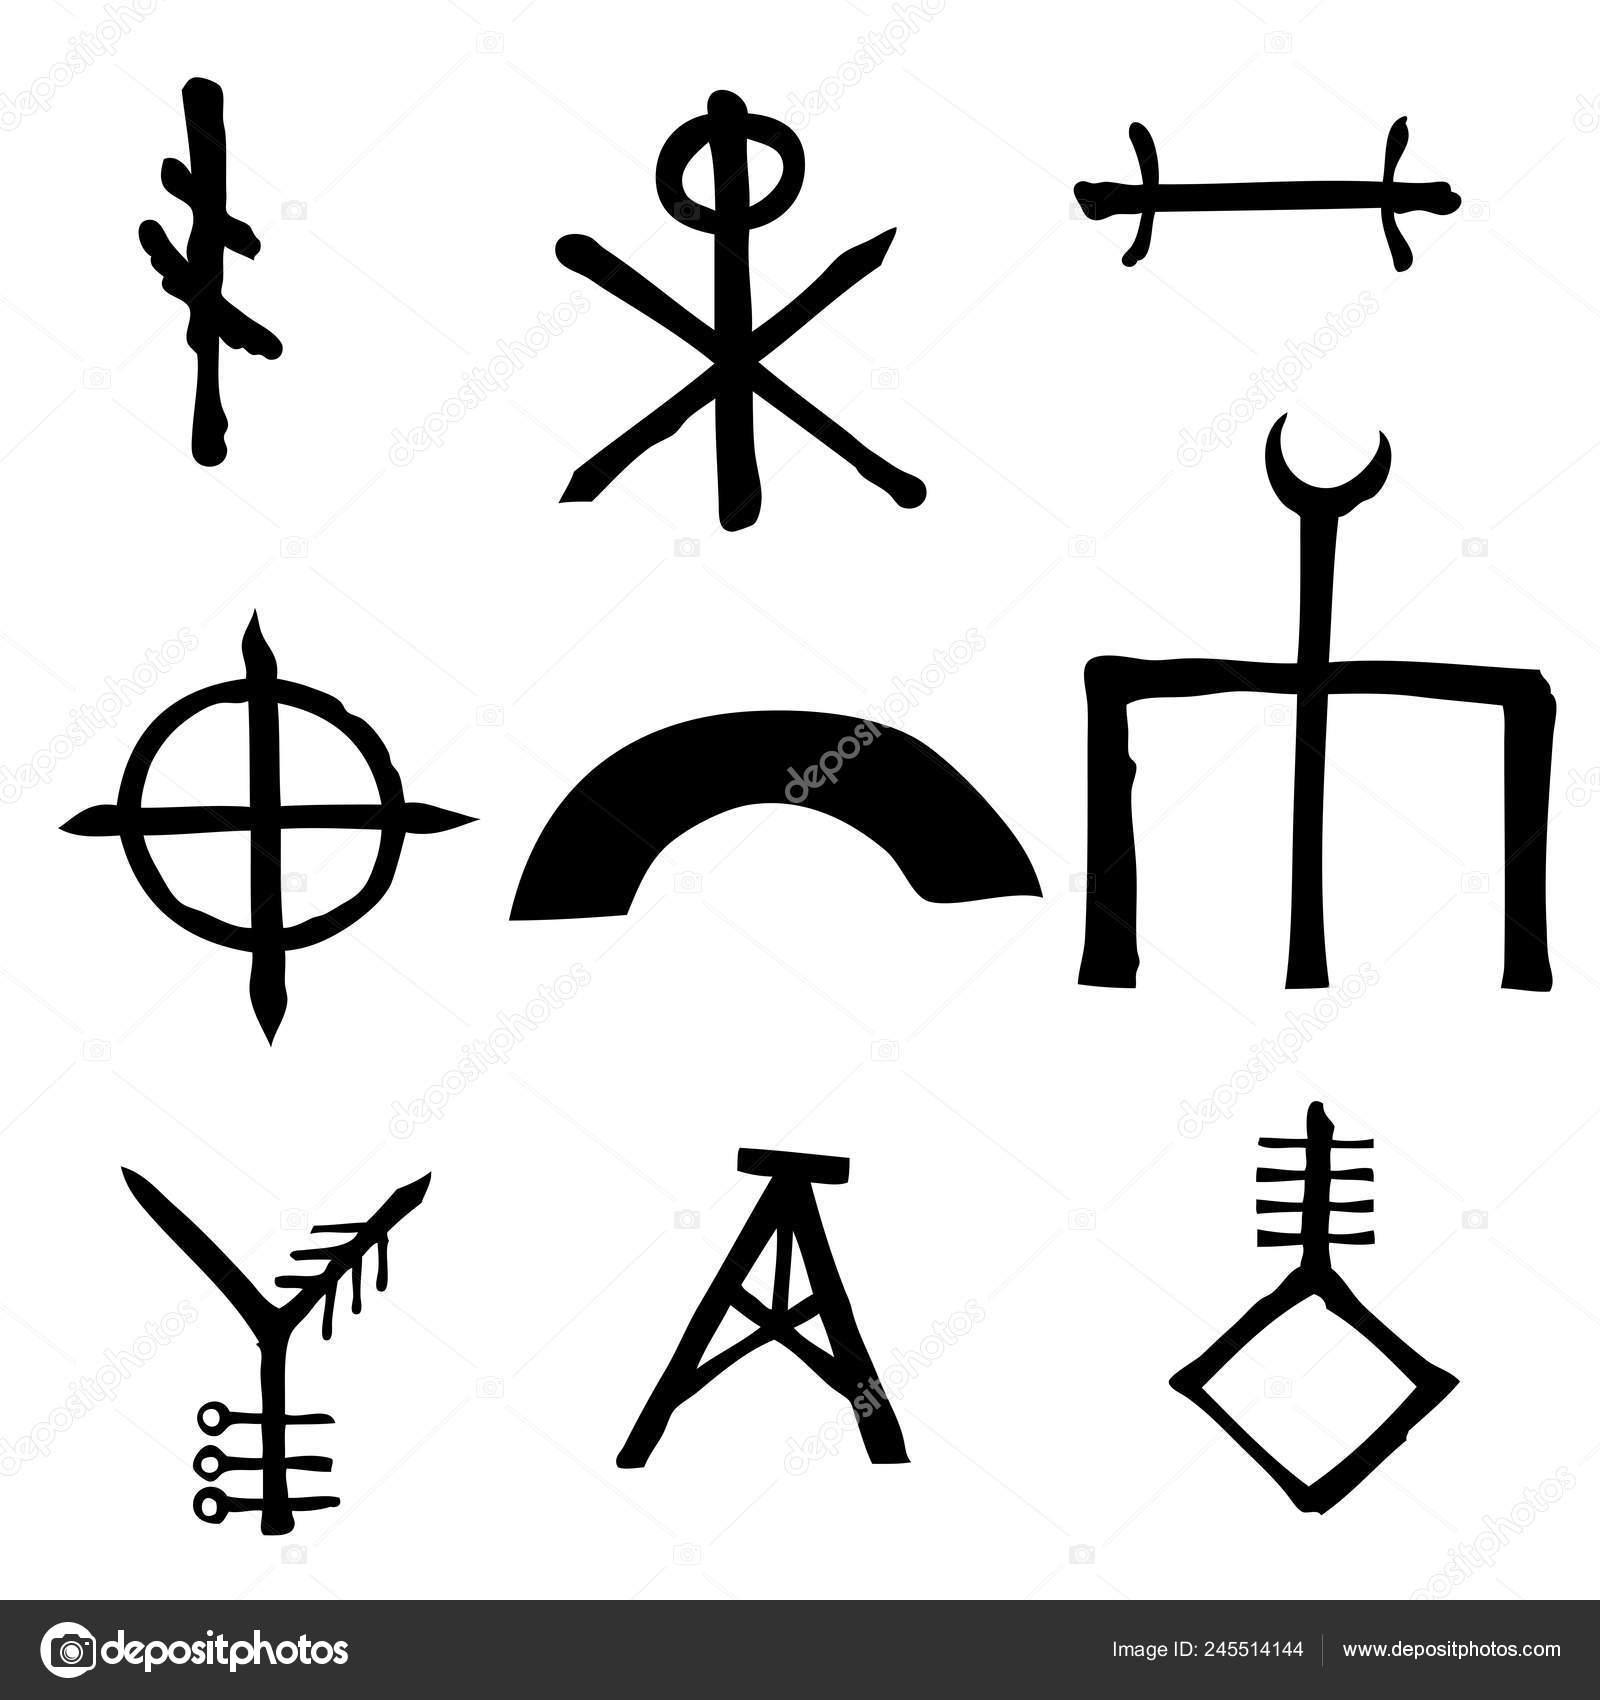 Wiccan Symbols Imaginary Cross Symbols Inspired Antichrist